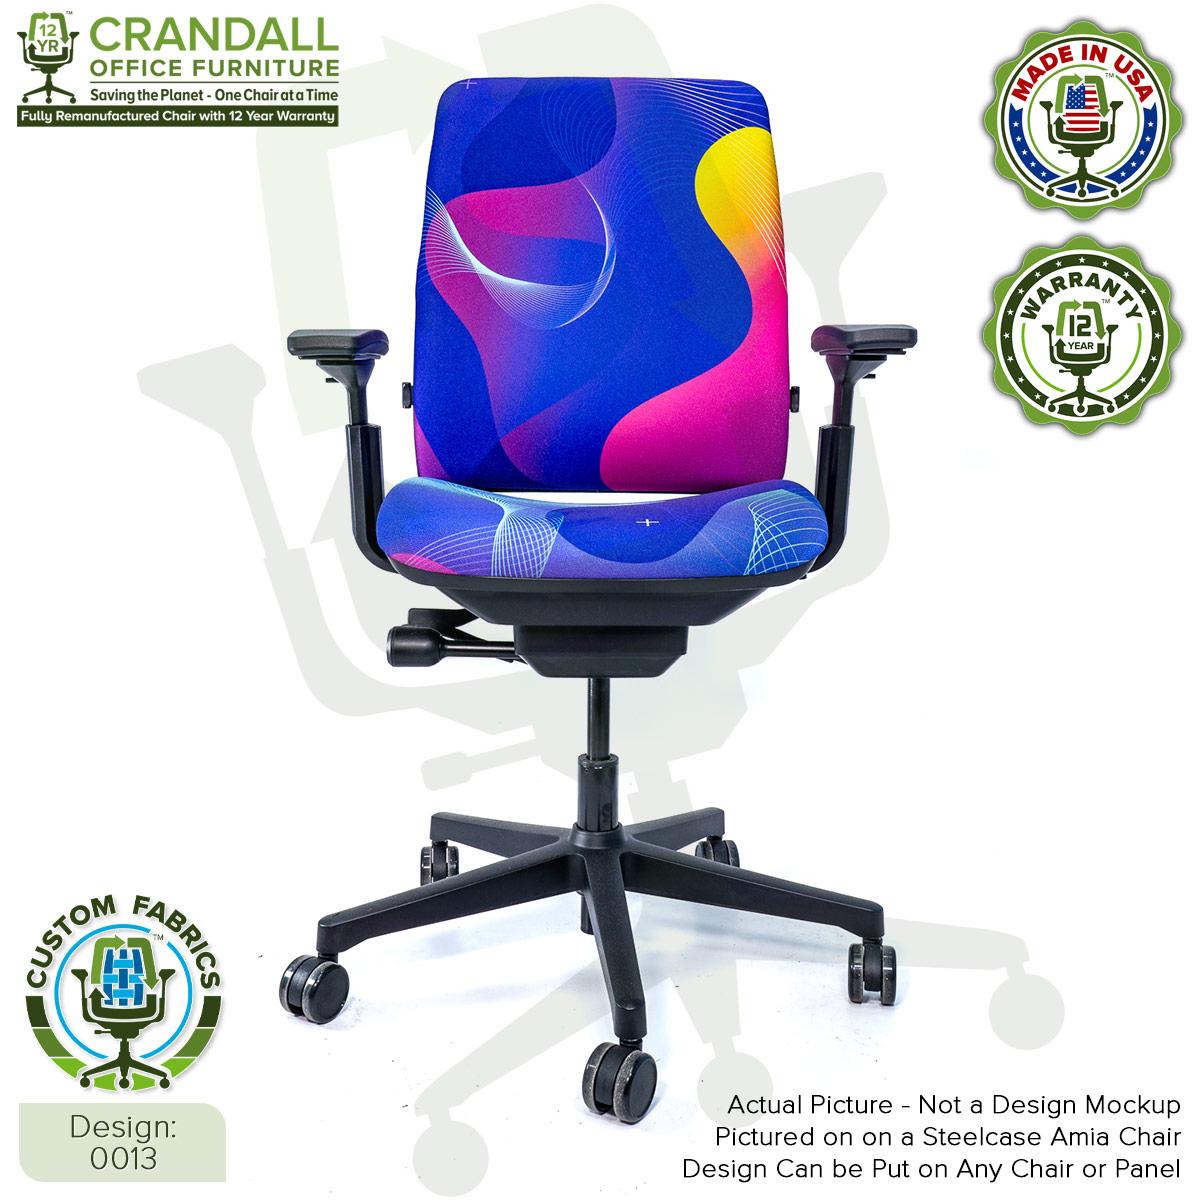 Custom Fabric Remanufactured Steelcase Amia Chair - Design 0013